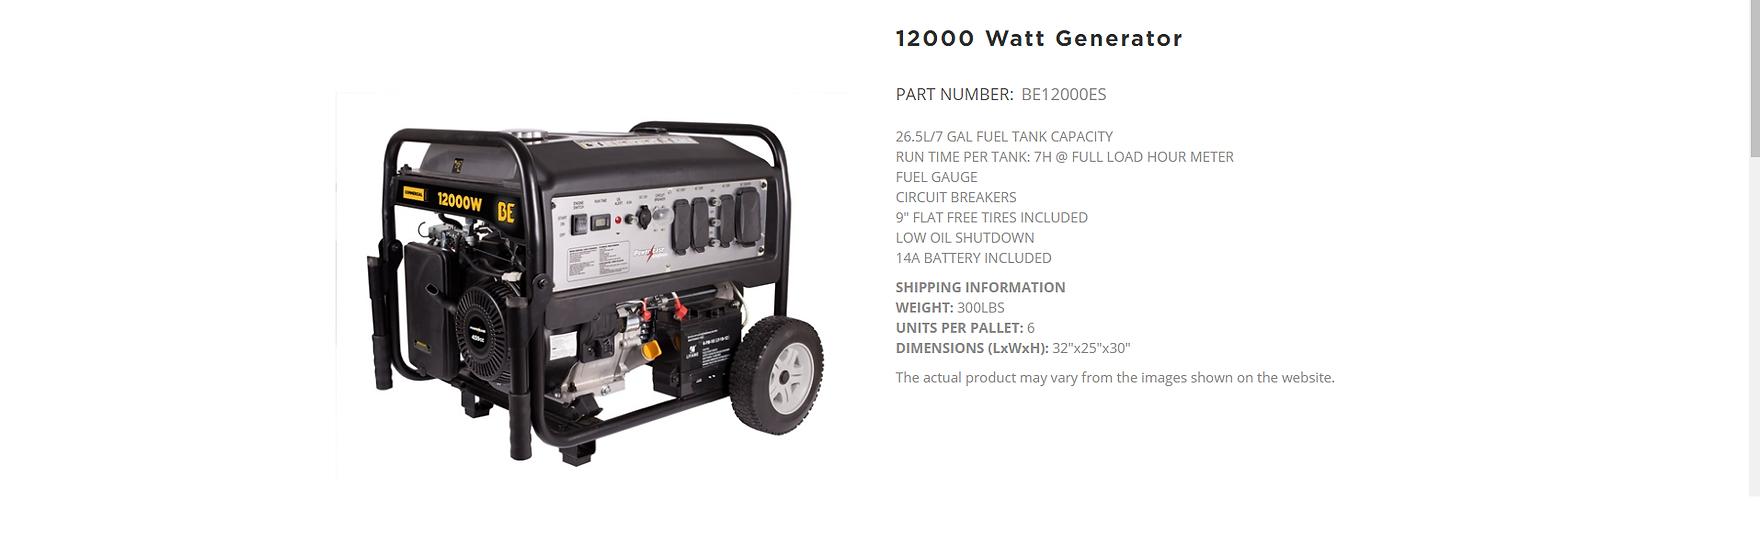 Generator 12000W.png